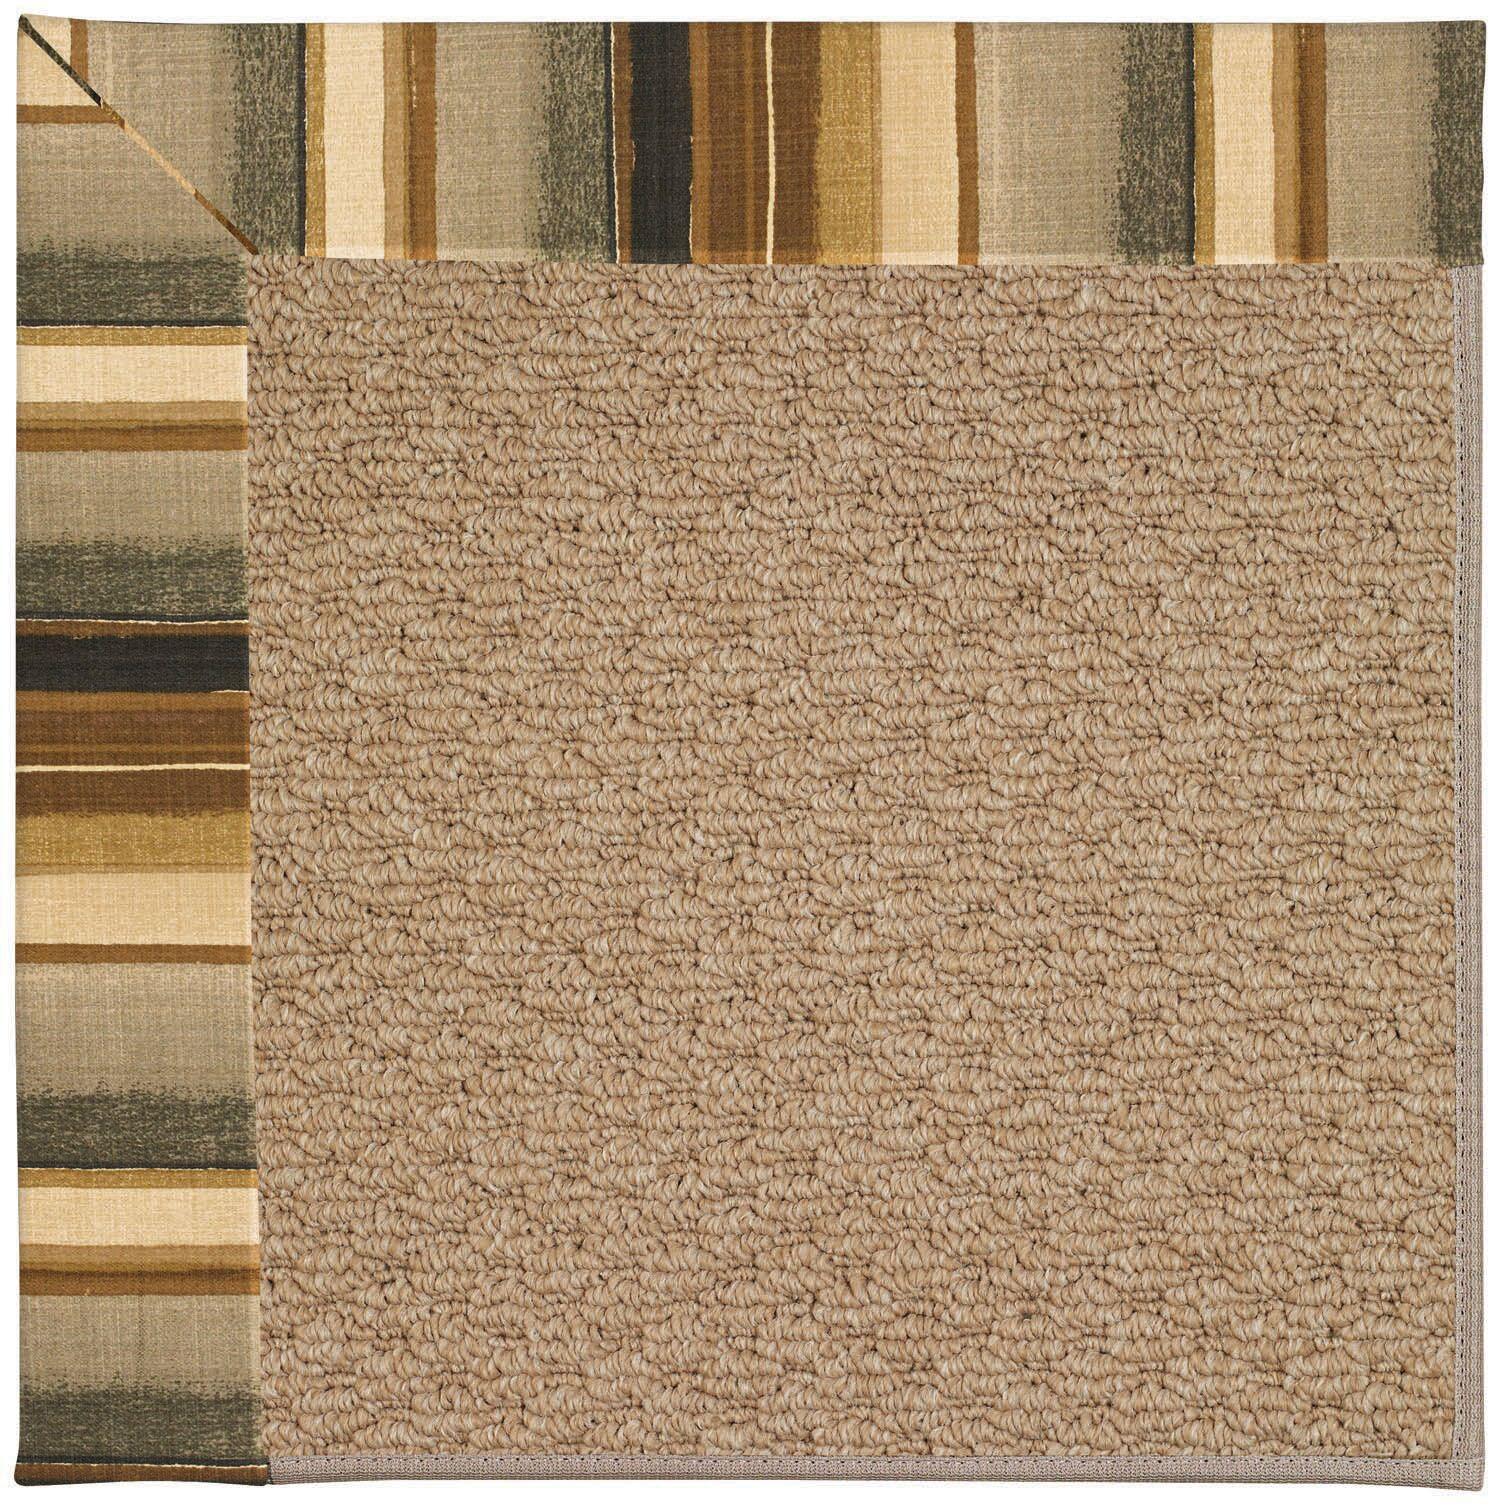 Lisle Machine Tufted Cinders/Brown Indoor/Outdoor Area Rug Rug Size: Rectangle 10' x 14'